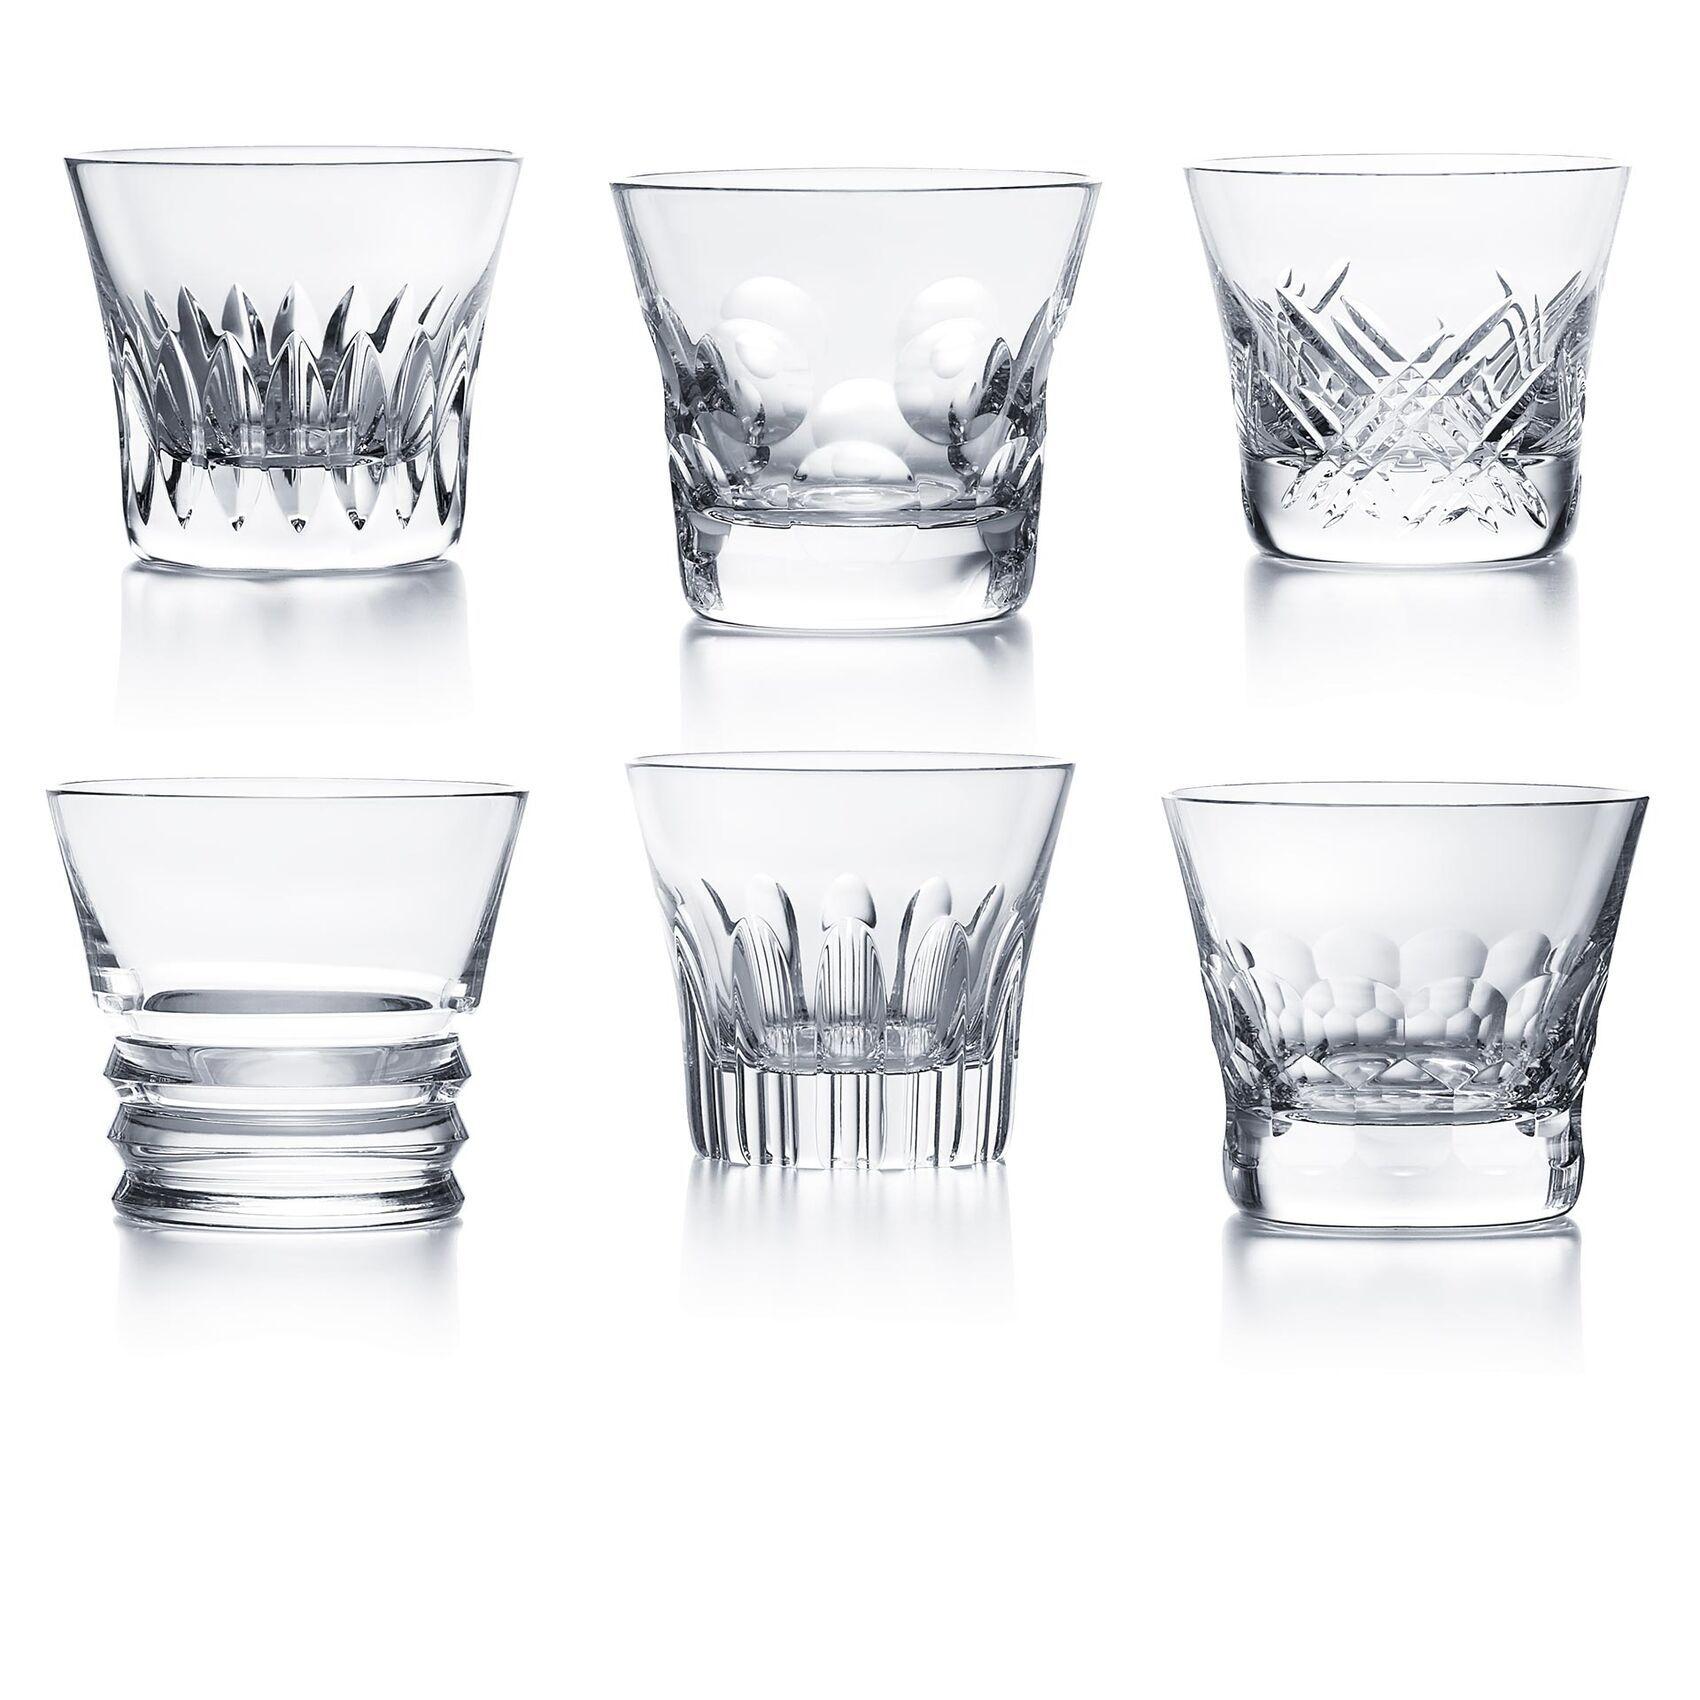 Set de copos Everyday x6, Baccarat, 2809854